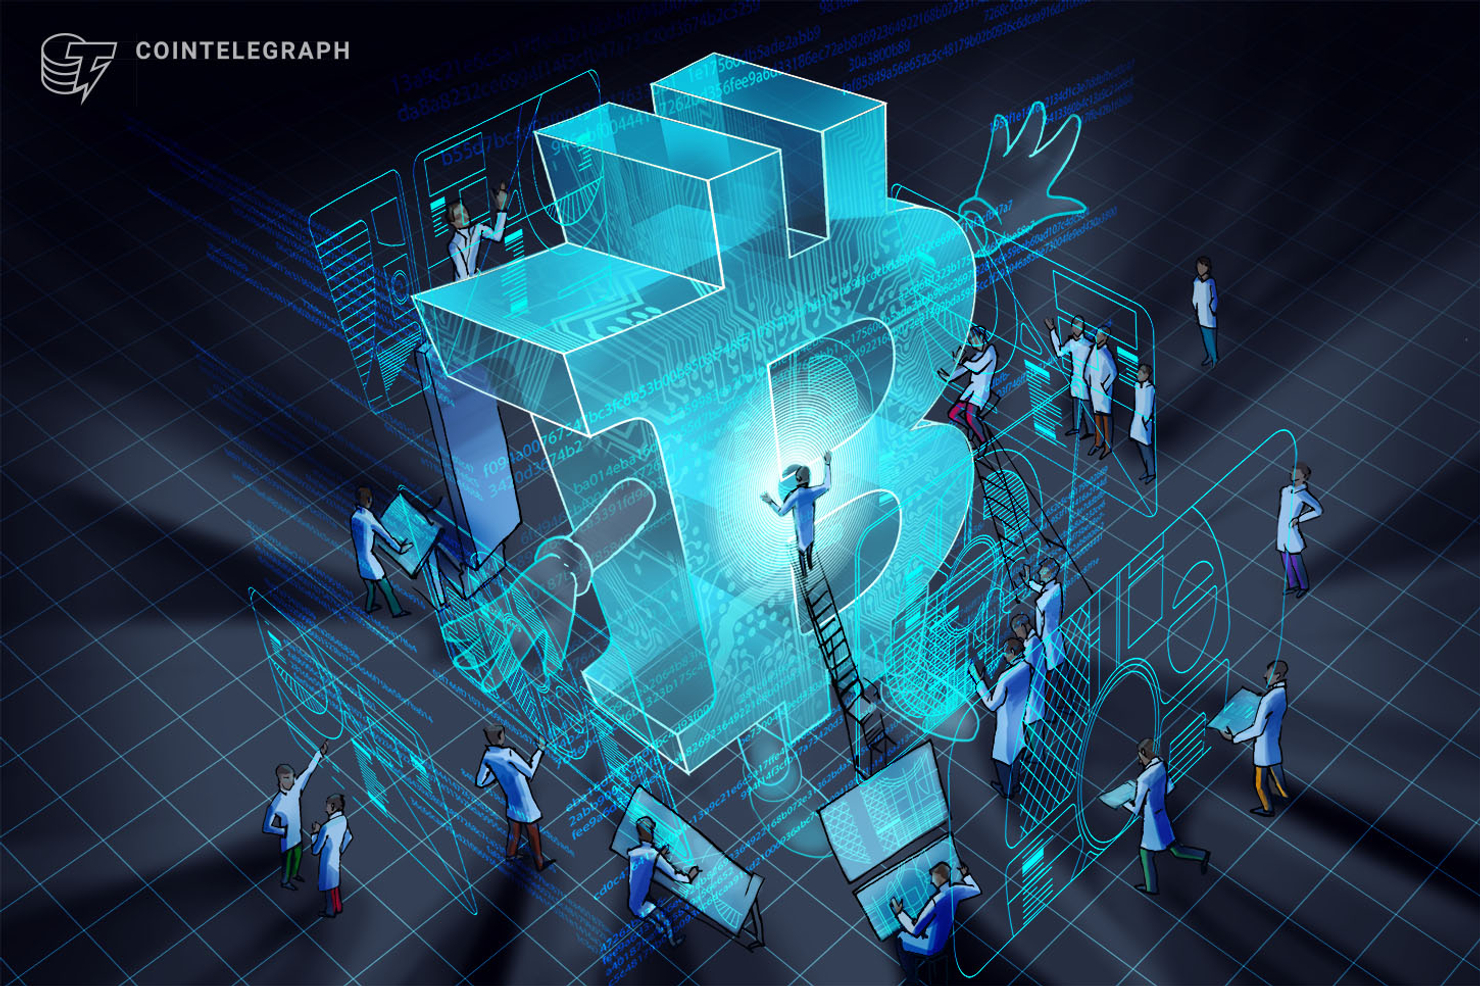 Grayscale: Bitcoin Gained 47% in US-China Trade War Drawdown